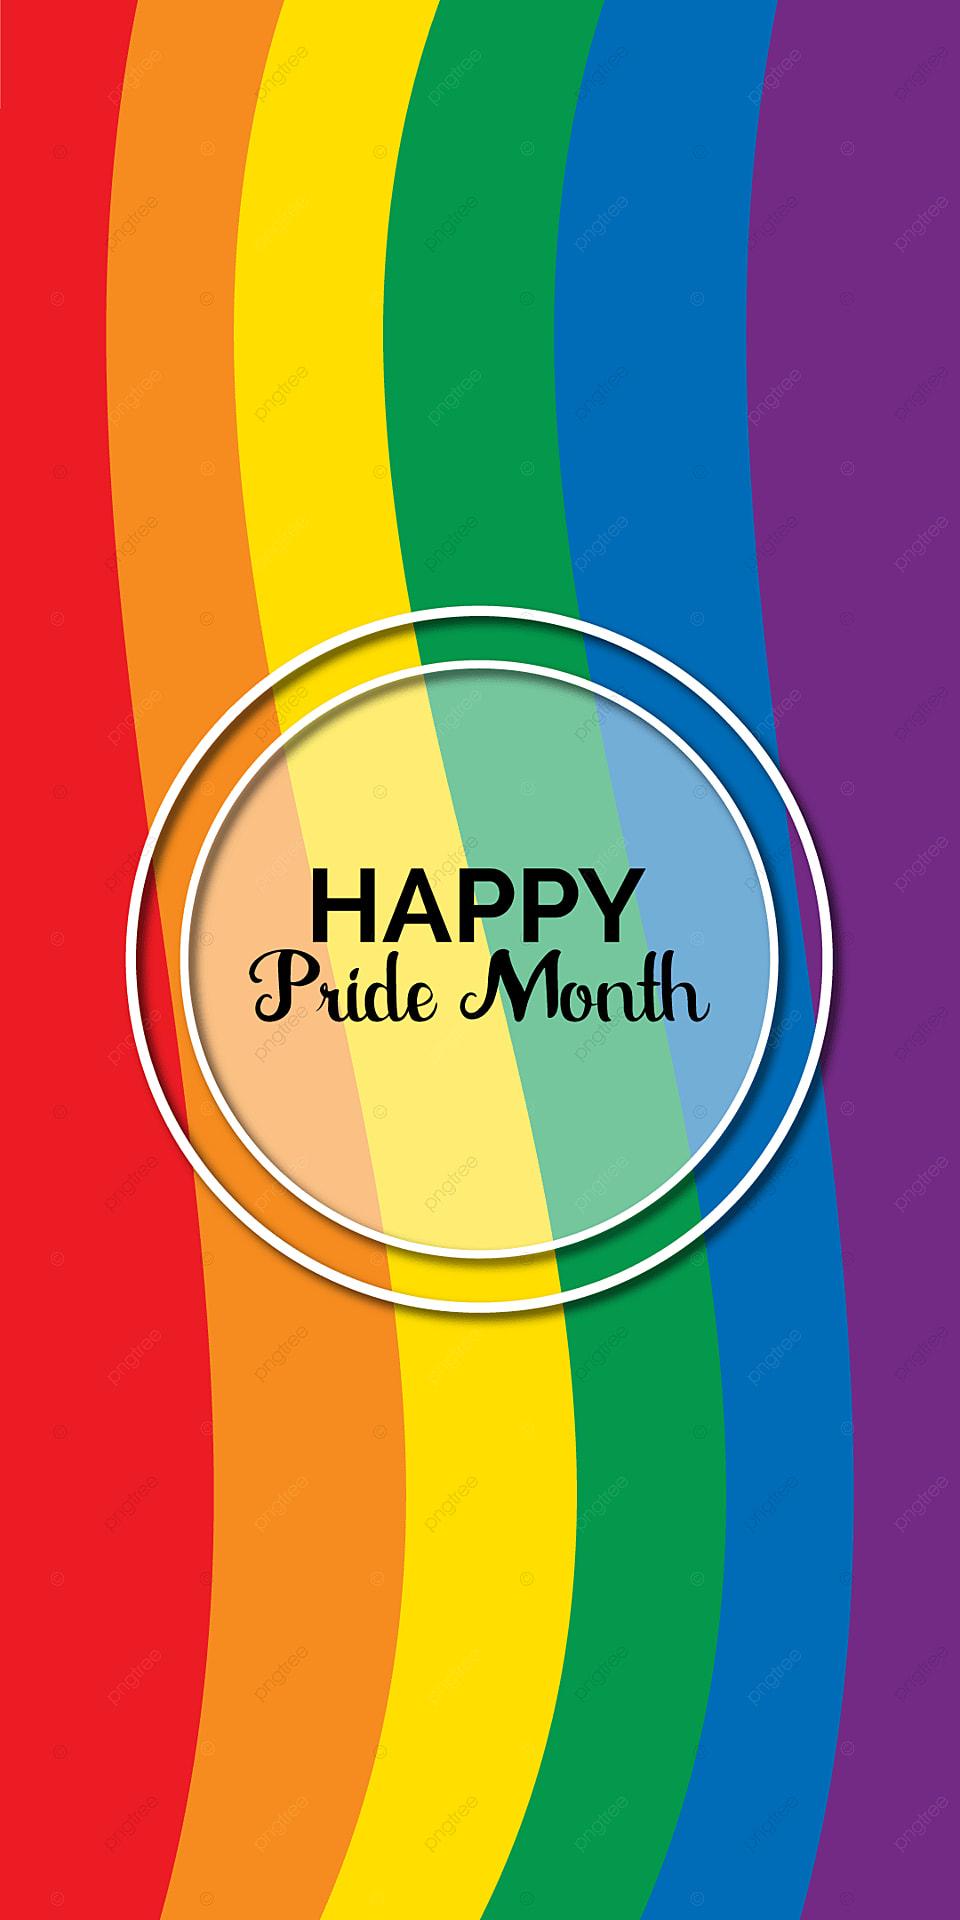 Happy Pride Month Mobile Phone Colorful Wallpaper Deaign Design 960x1920